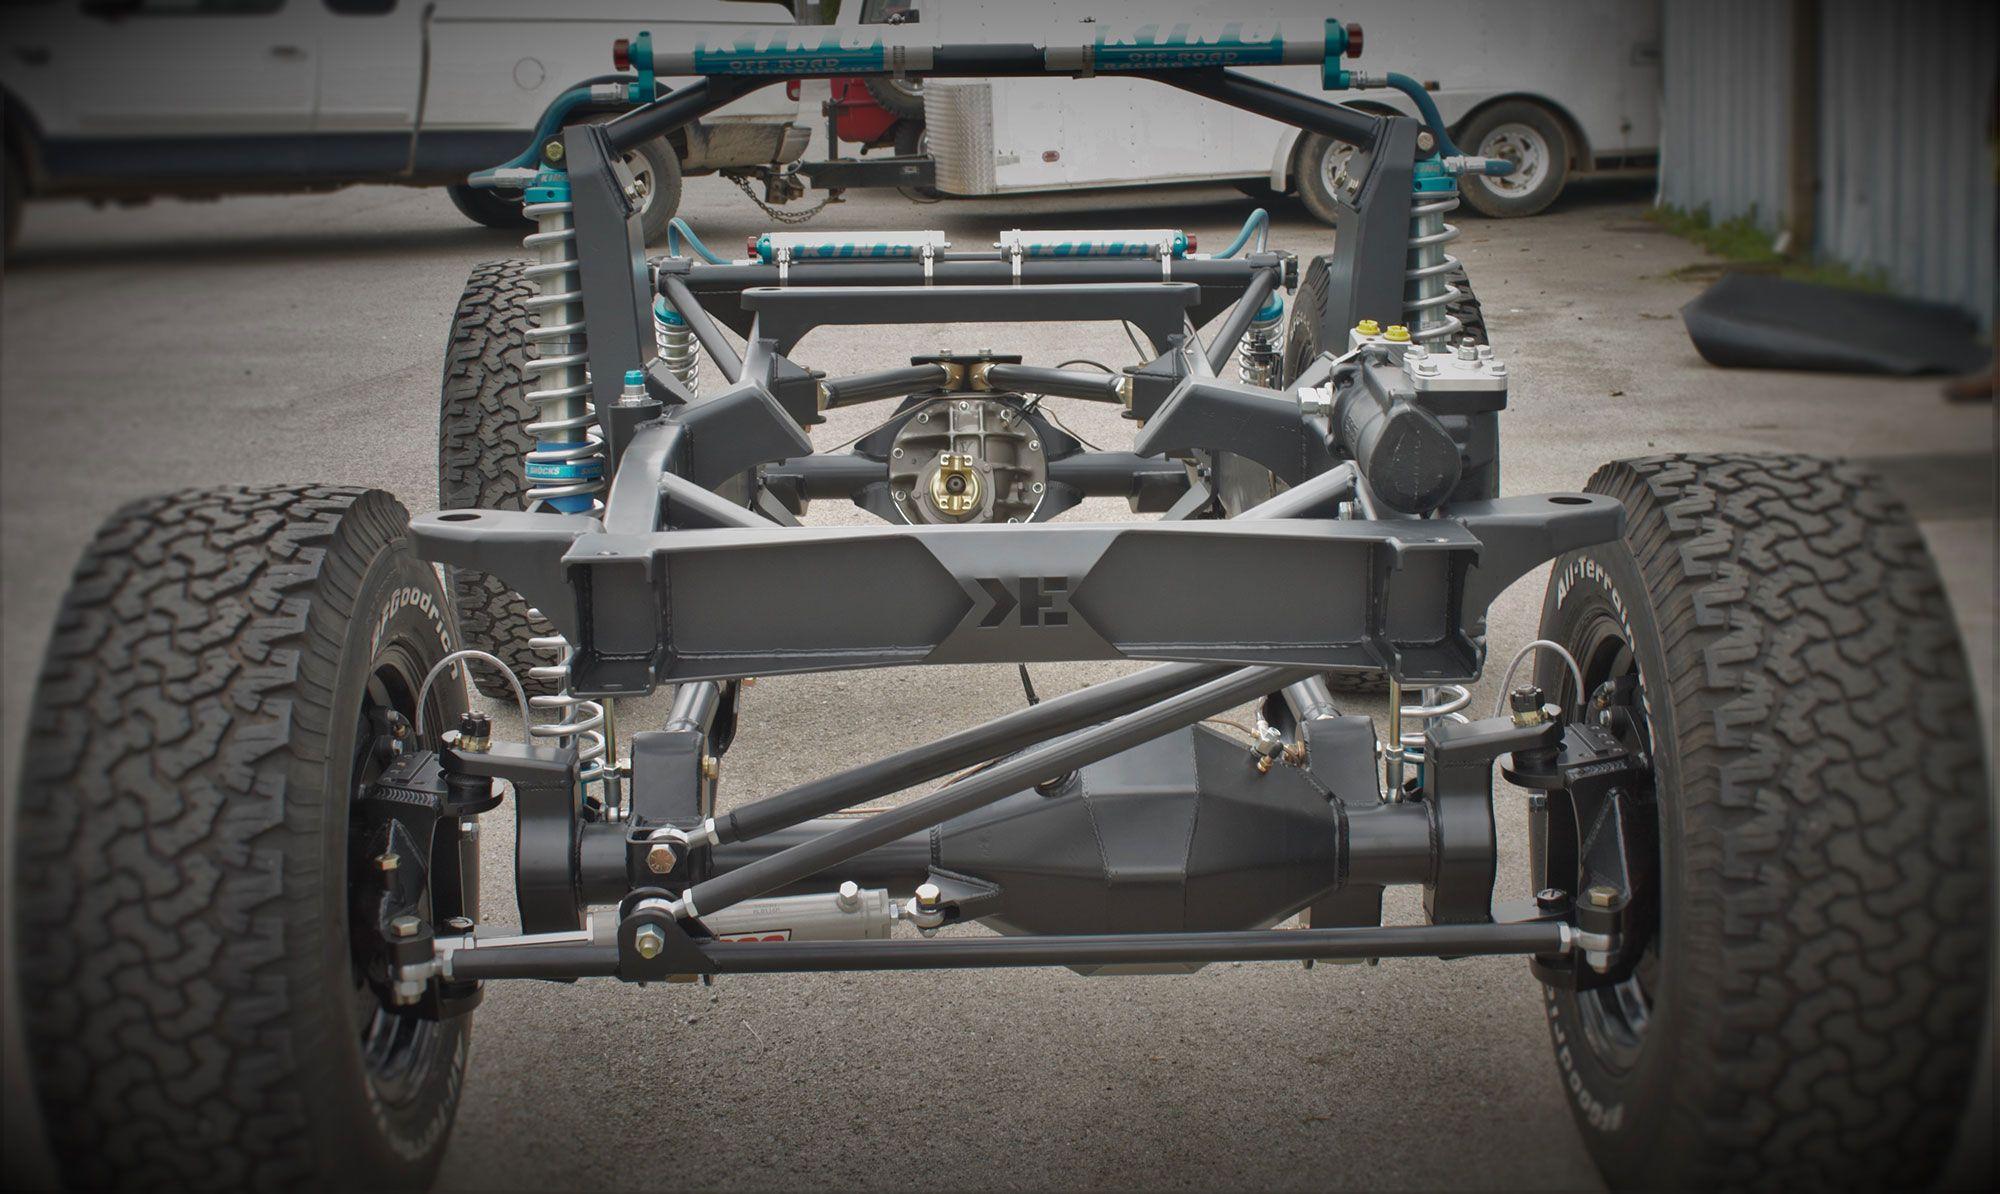 T2 Early Bronco Frame | bronco stuff and mechanics | Early